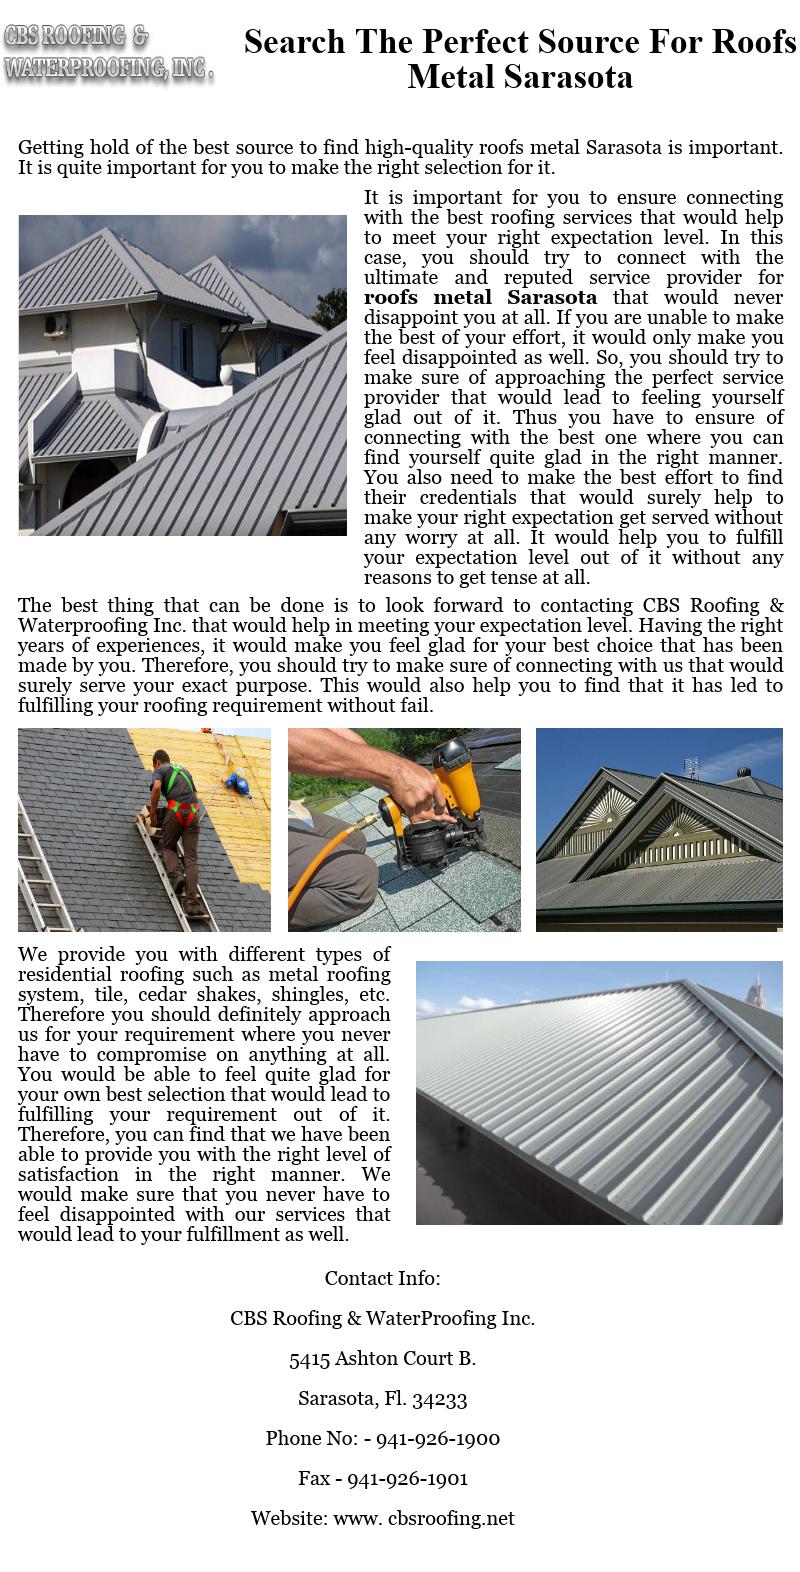 Gaf Timberline American Harvest Shingles Cbs Roofing Sarasota Bradenton Fl Metal Roof Cool Roof Sarasota